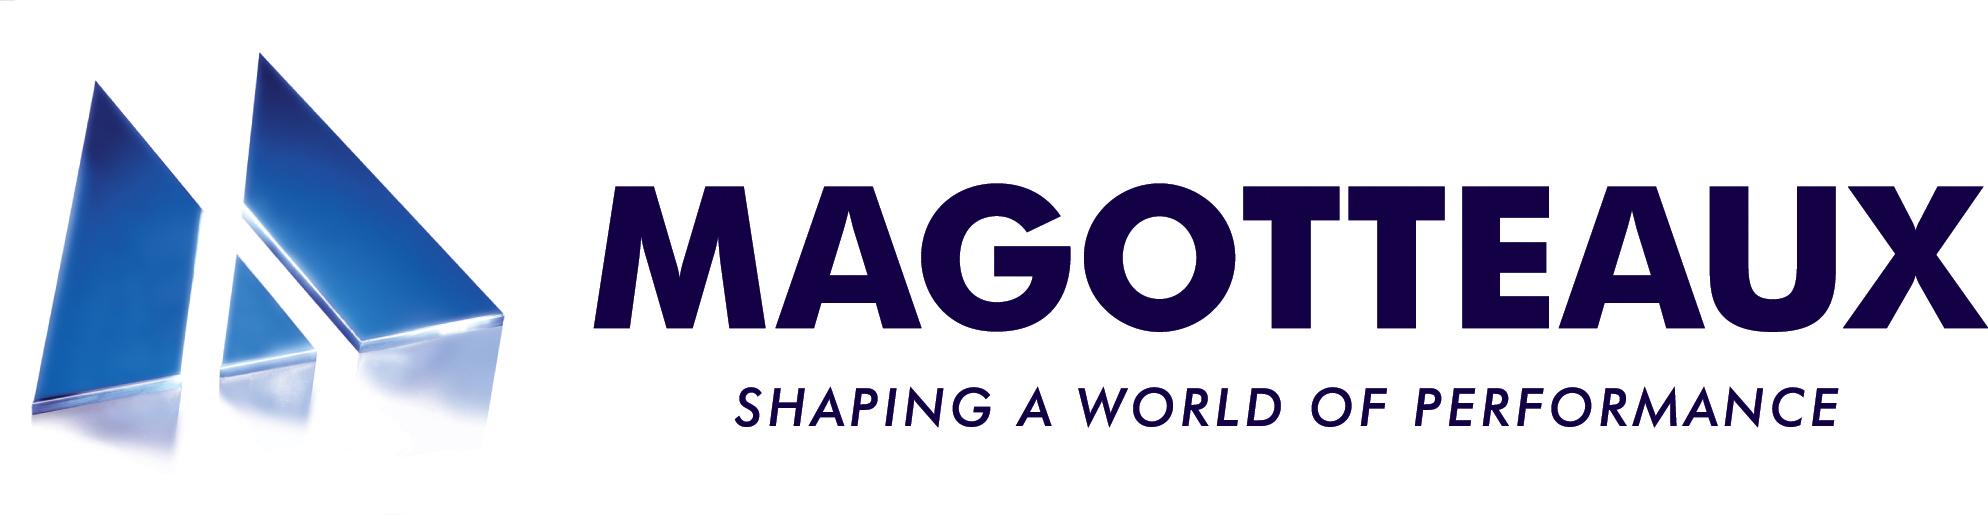 mag-2000-232